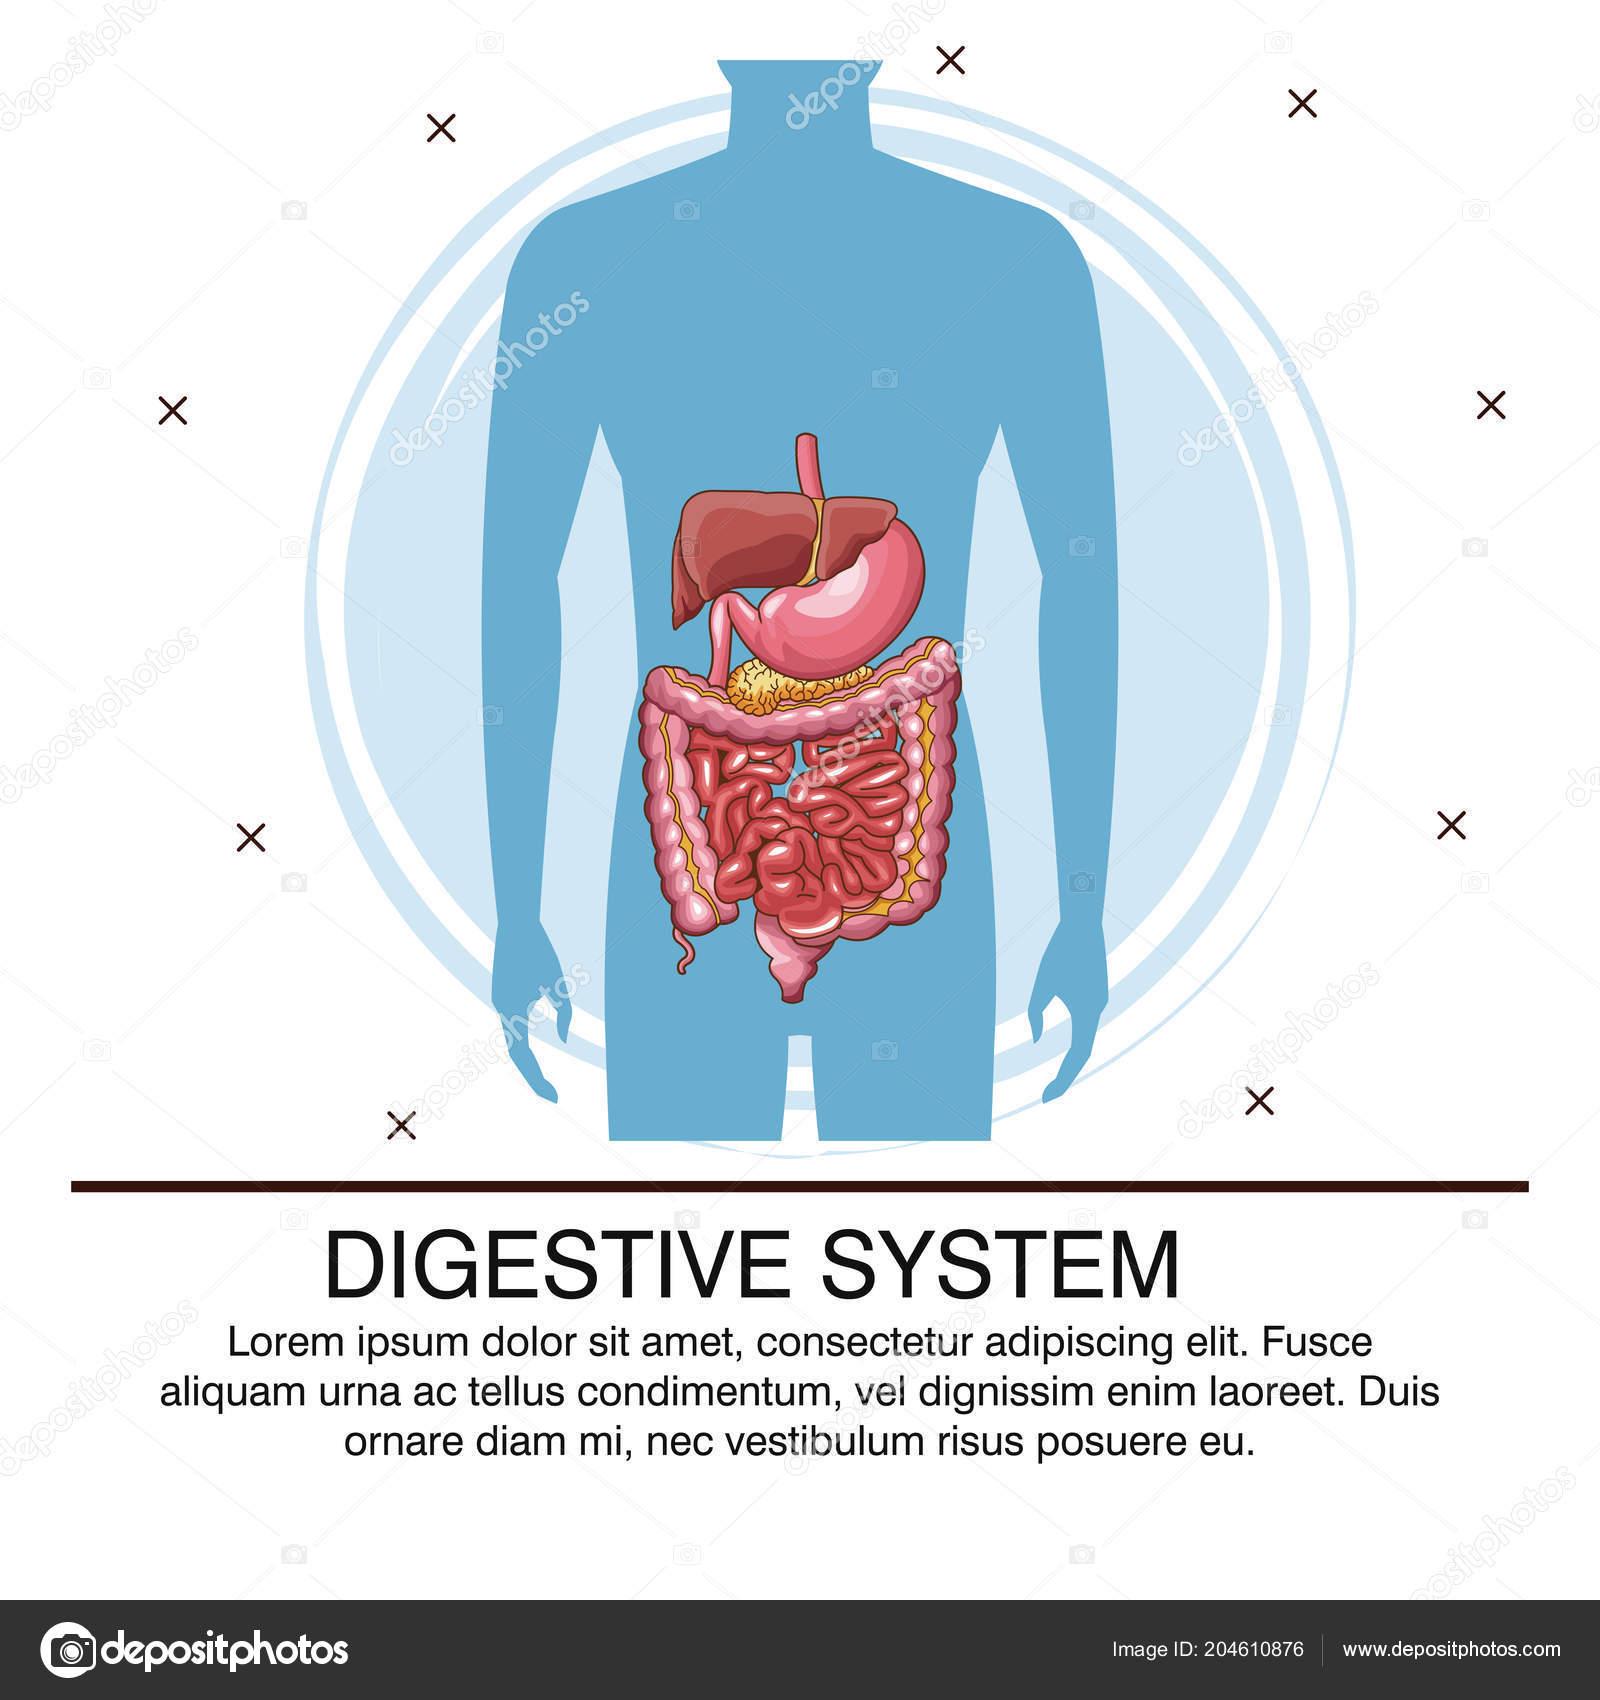 Digestive System Poster Stock Vector Jemastock 204610876